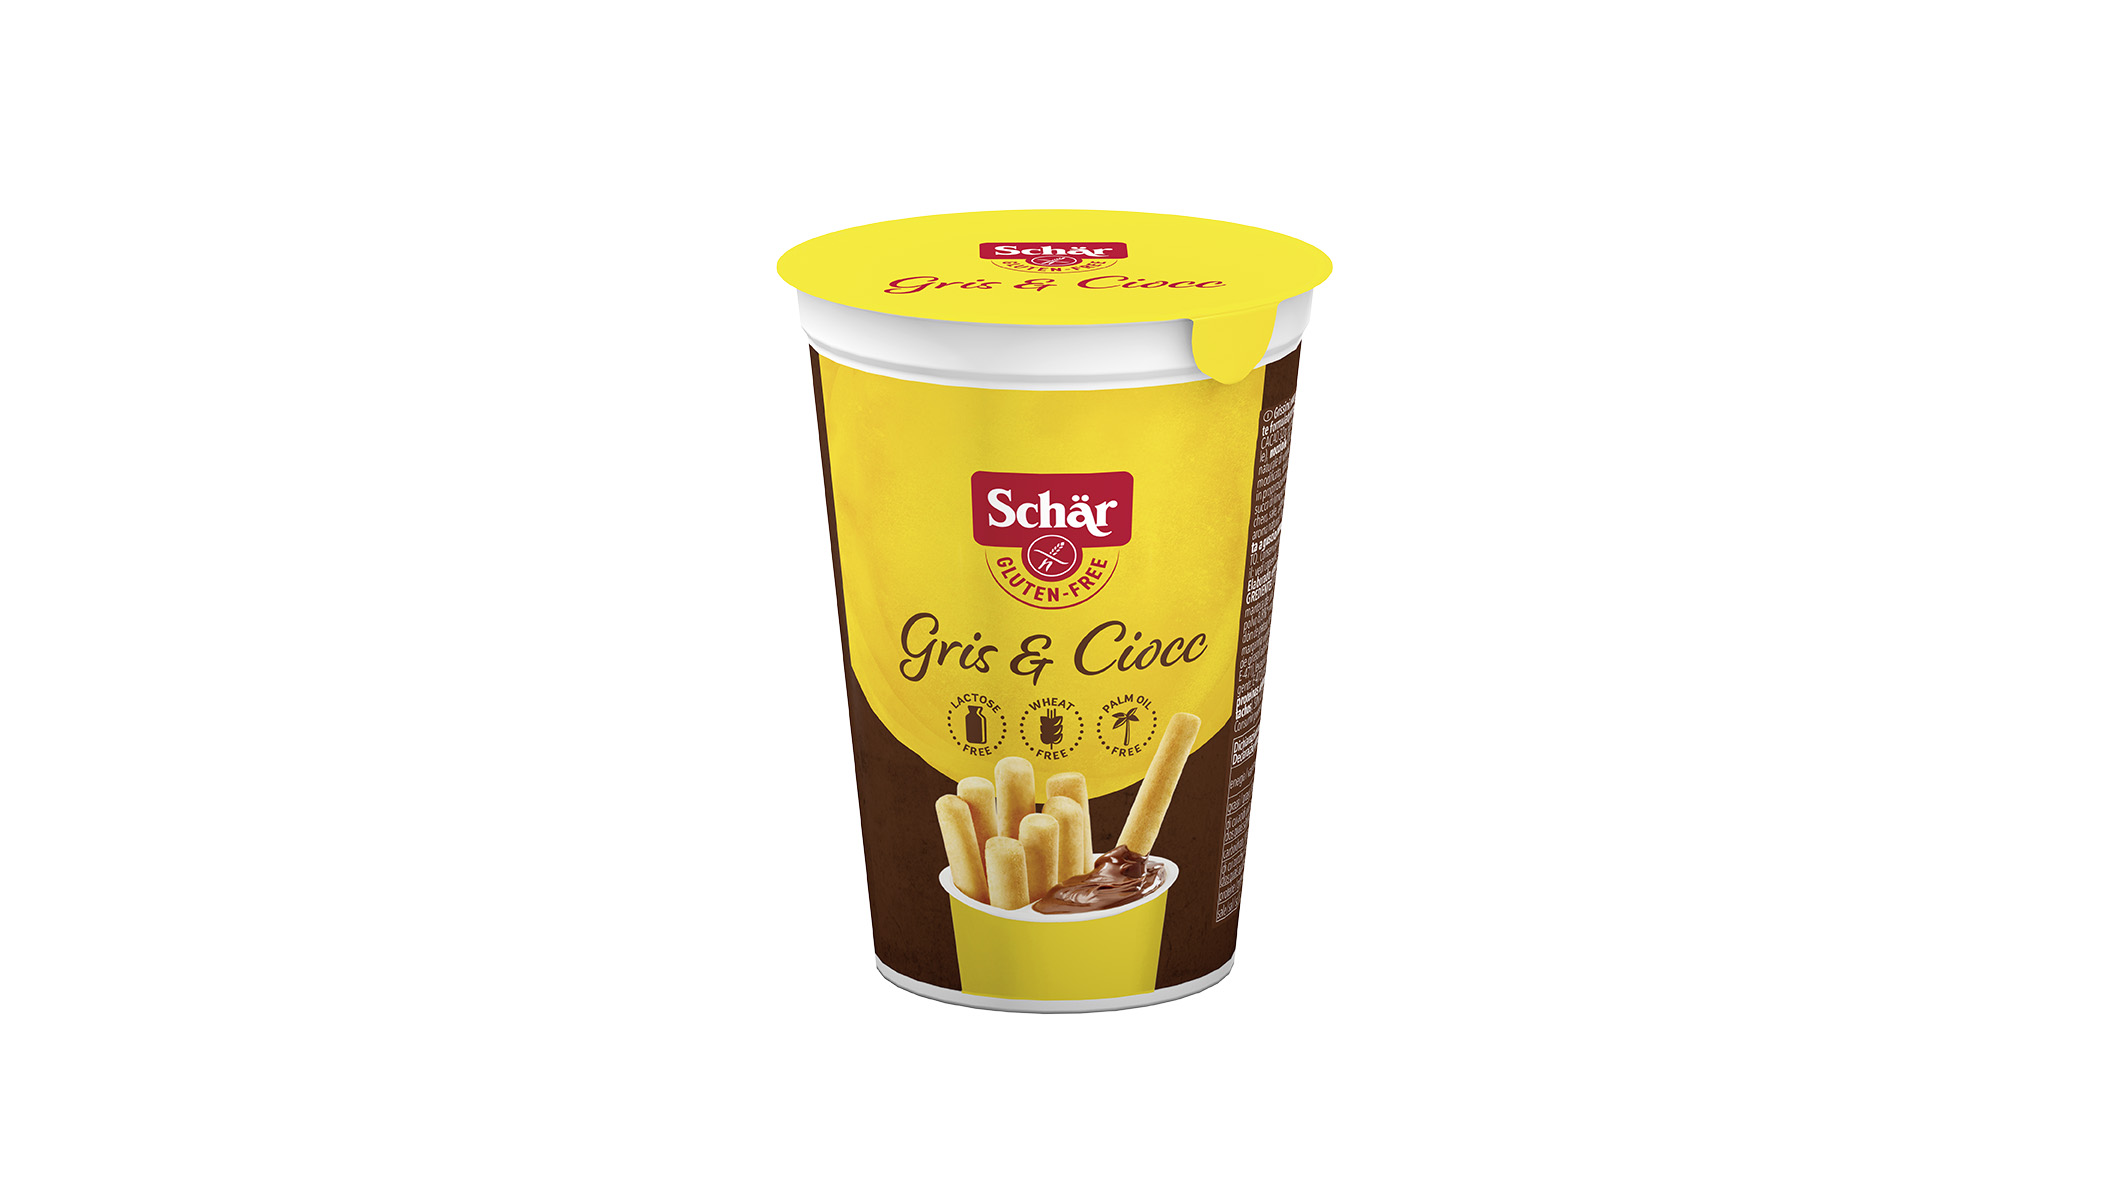 Brezglutenski grisini s čokoladno kremo – Gris & Ciocc